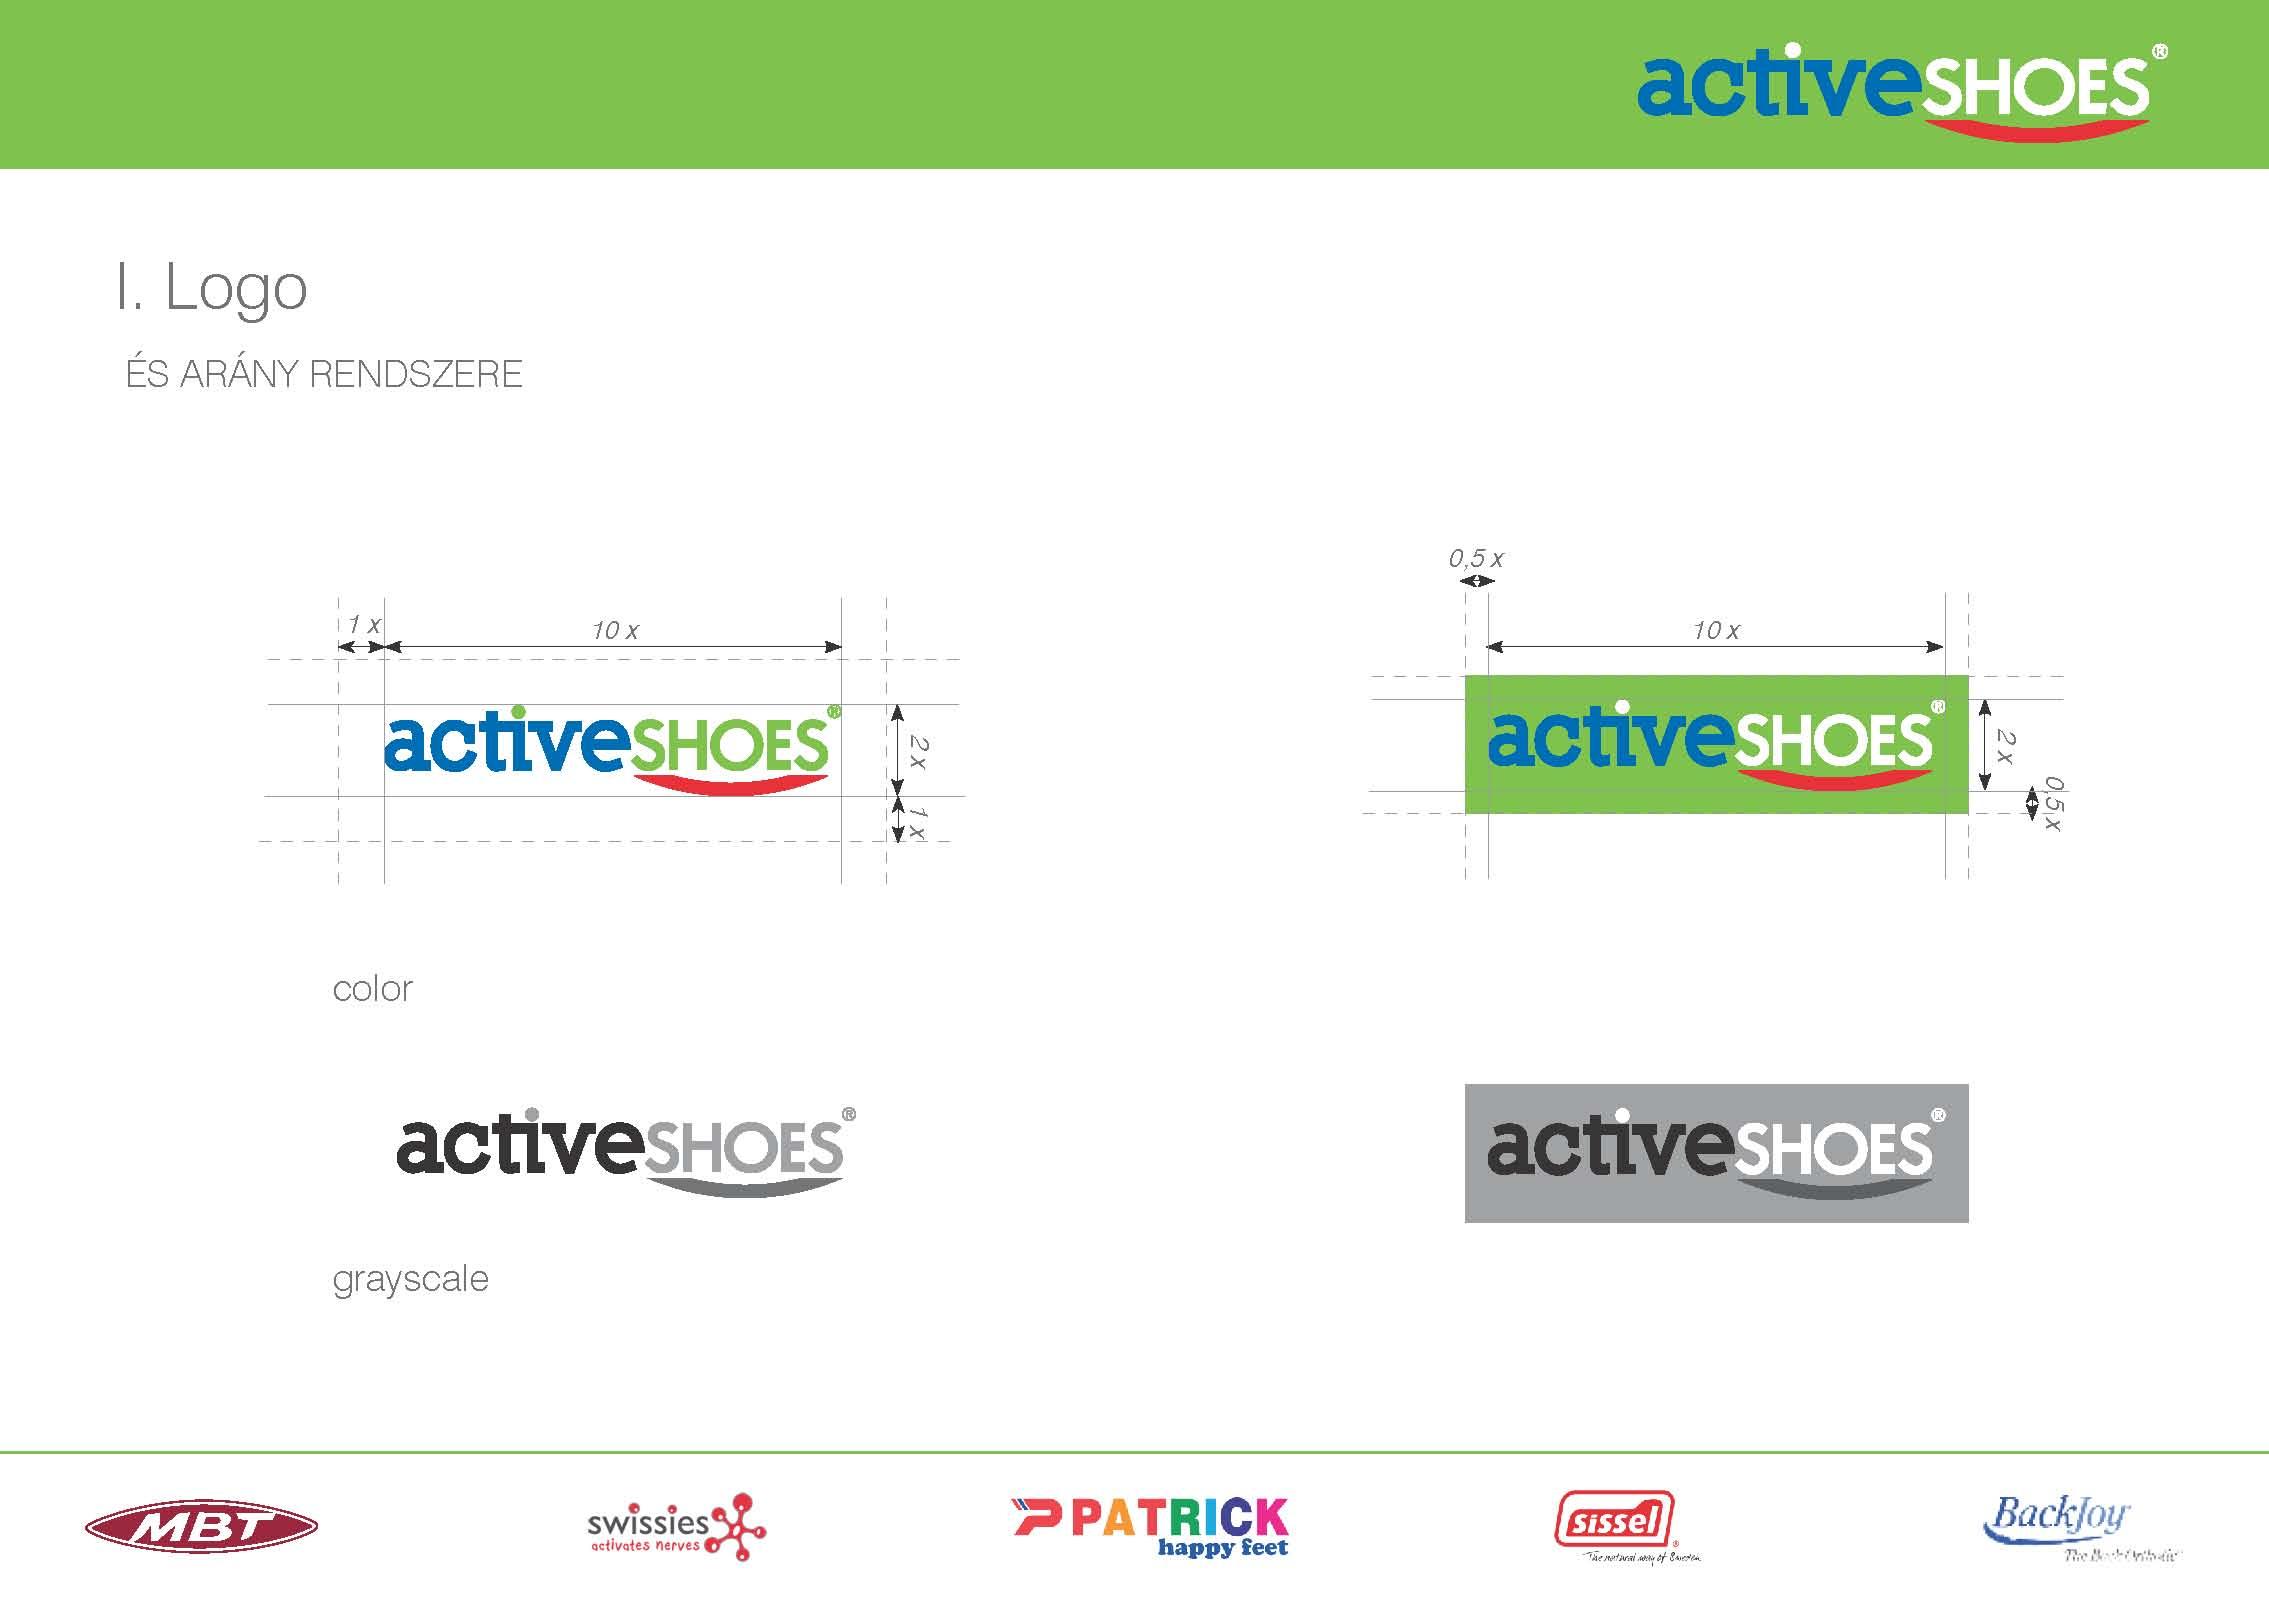 activeshoes_designbook_2011_07_A4-es_4_Page_03